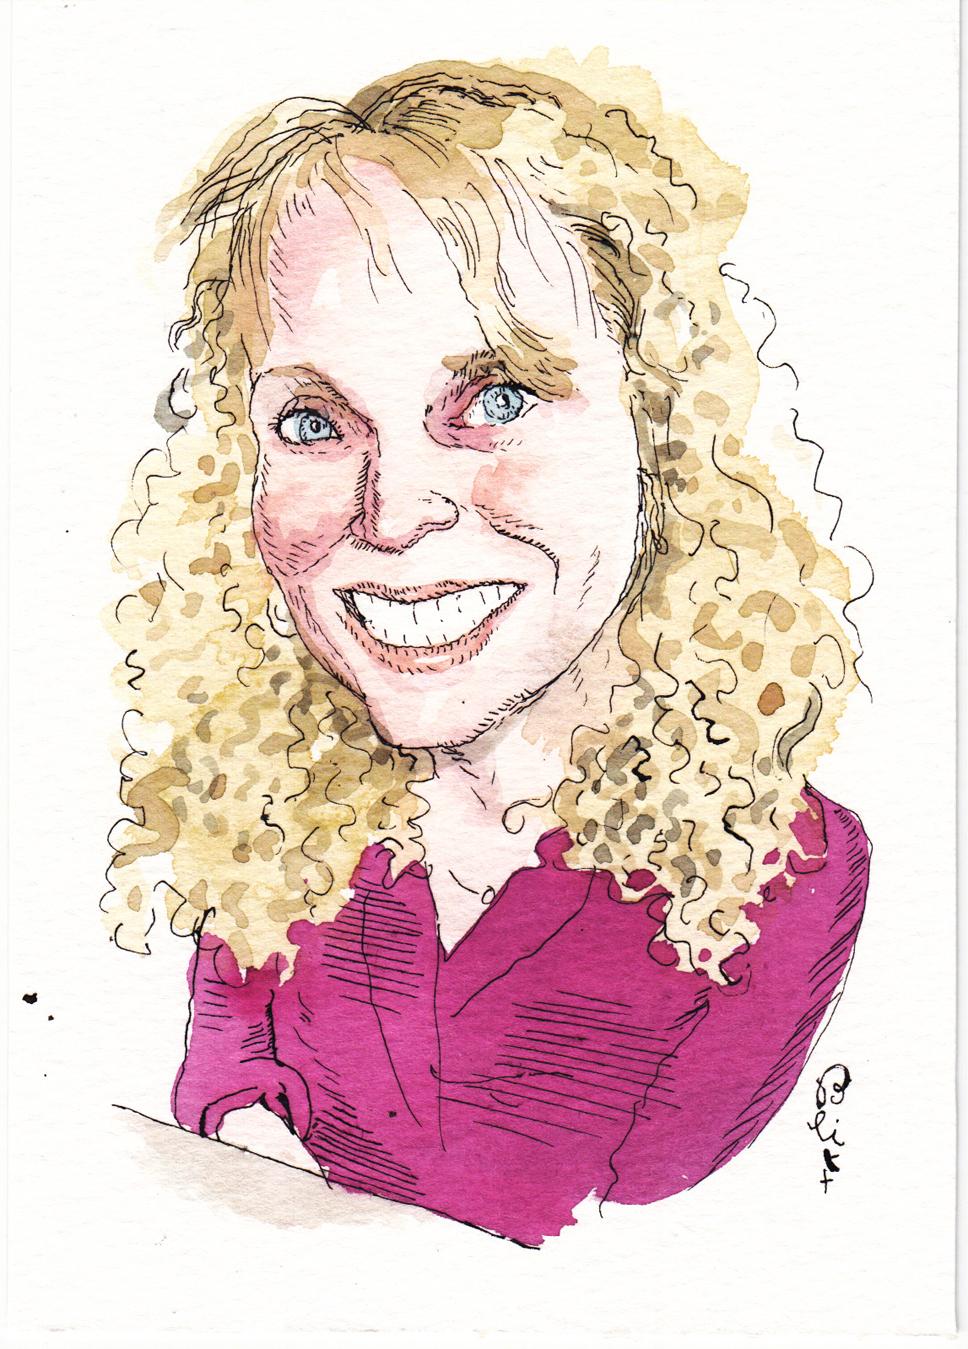 Amy Amdur; illustration by Barry Blitt